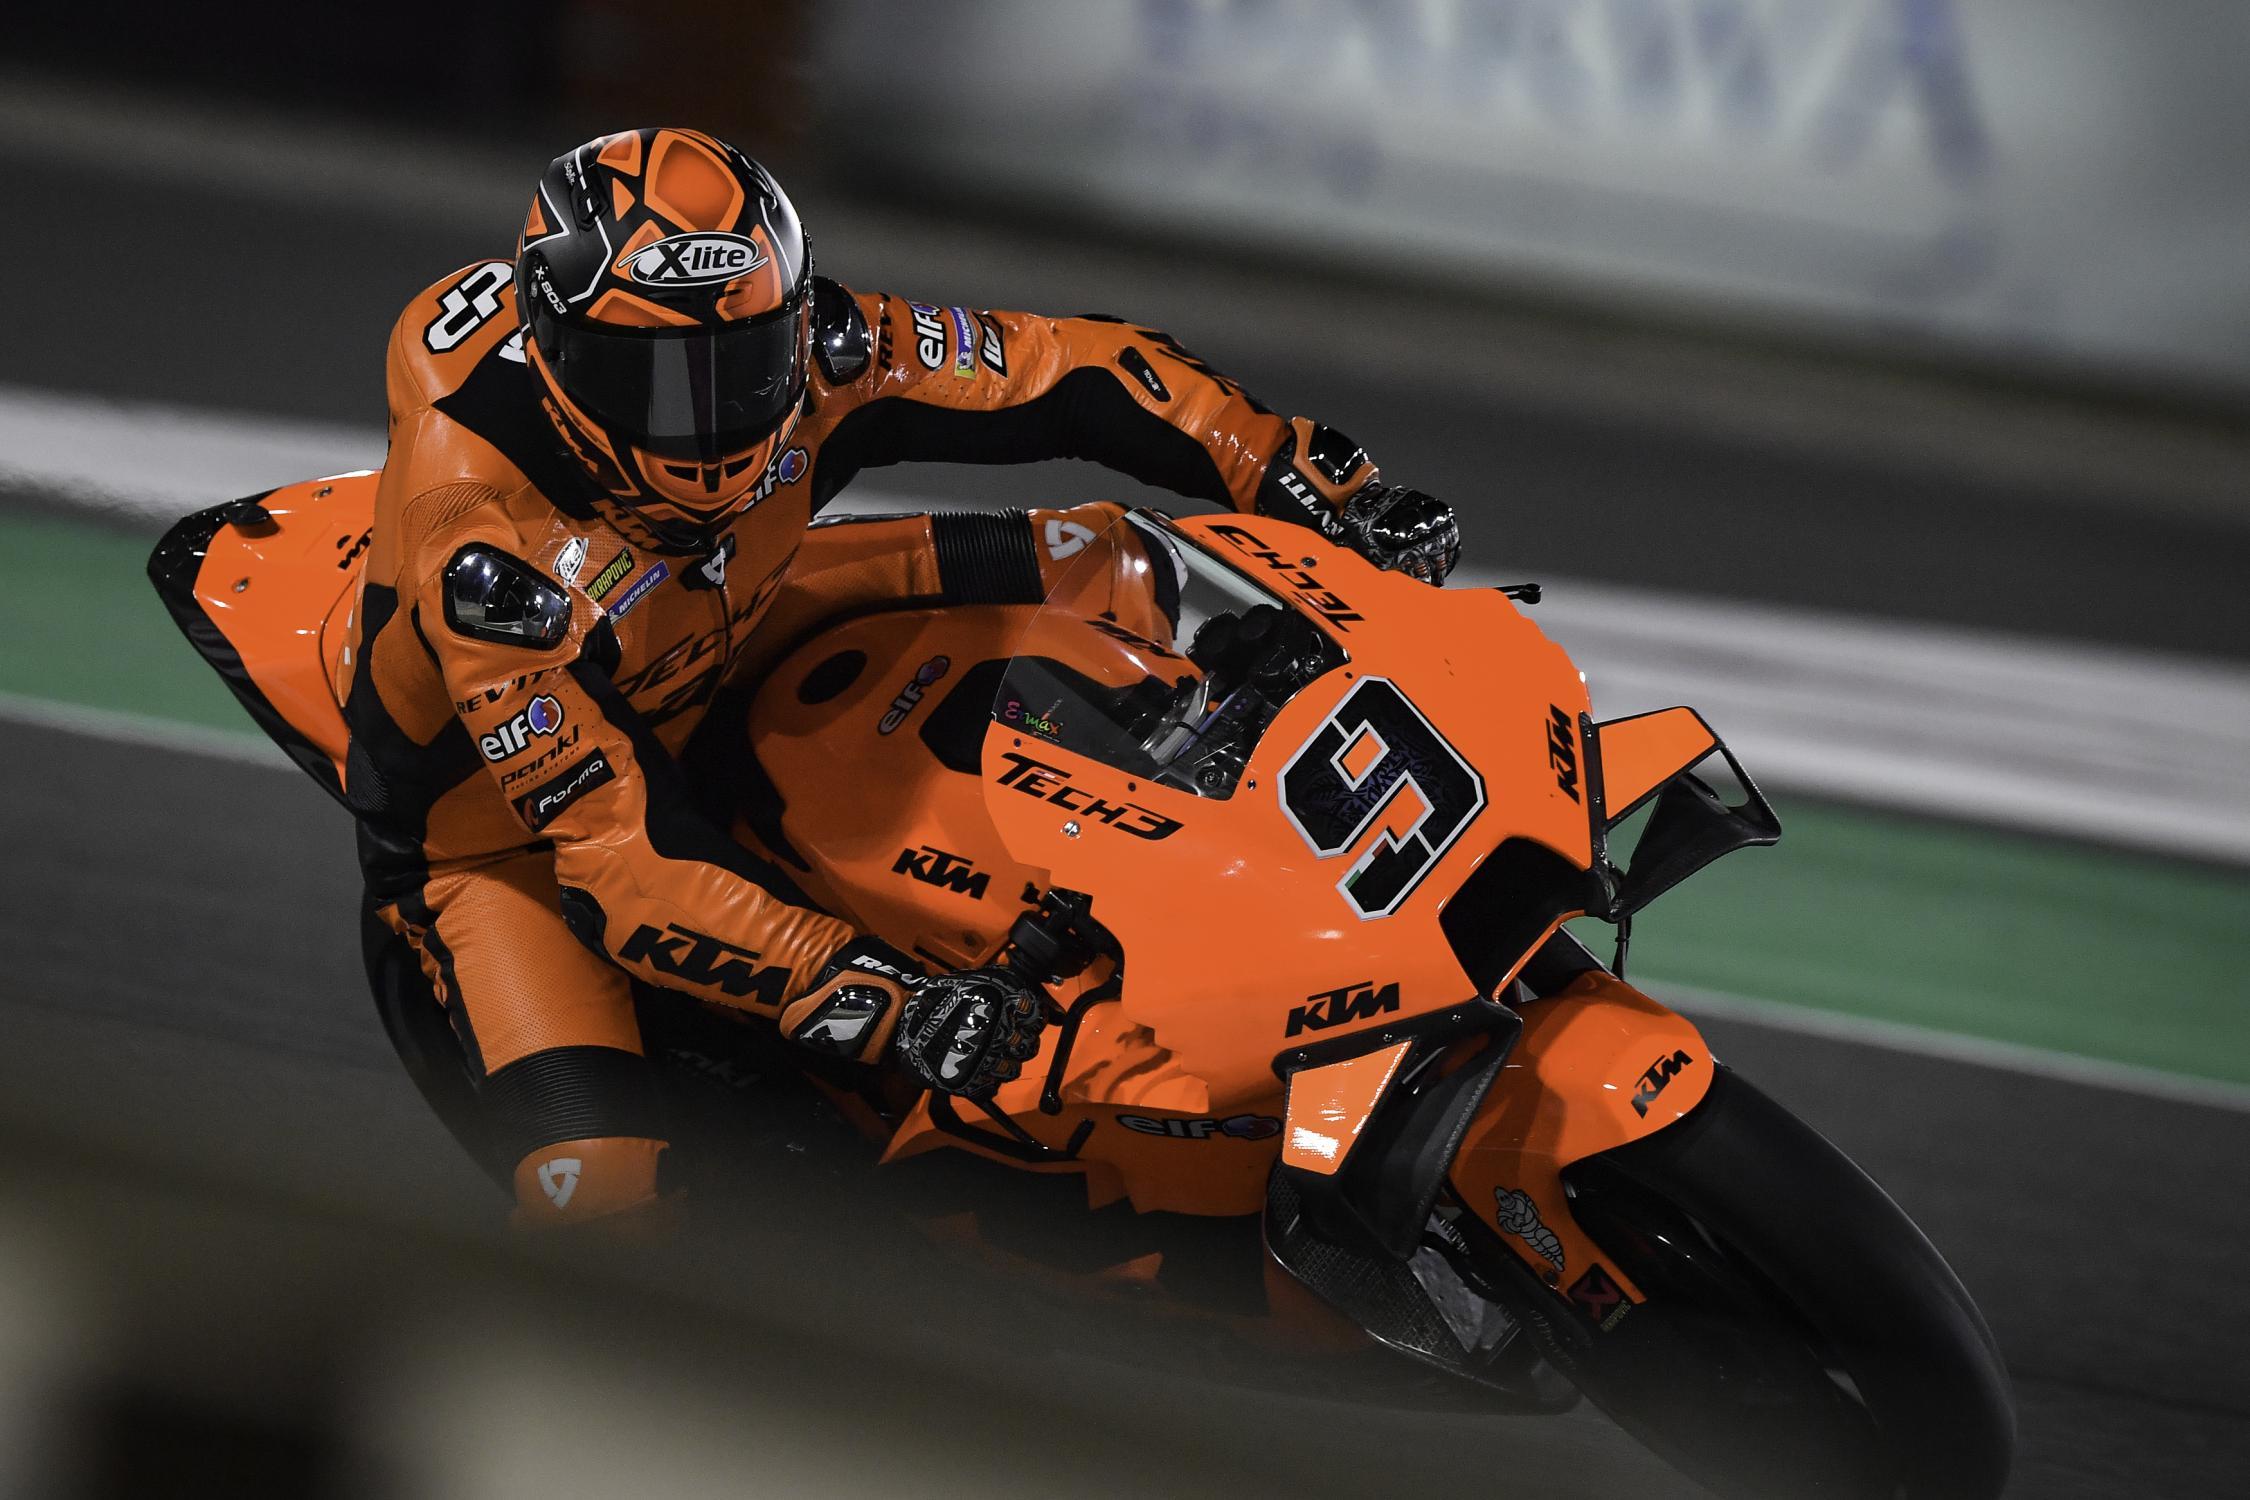 Danilo Petrucci KTM Tech 3